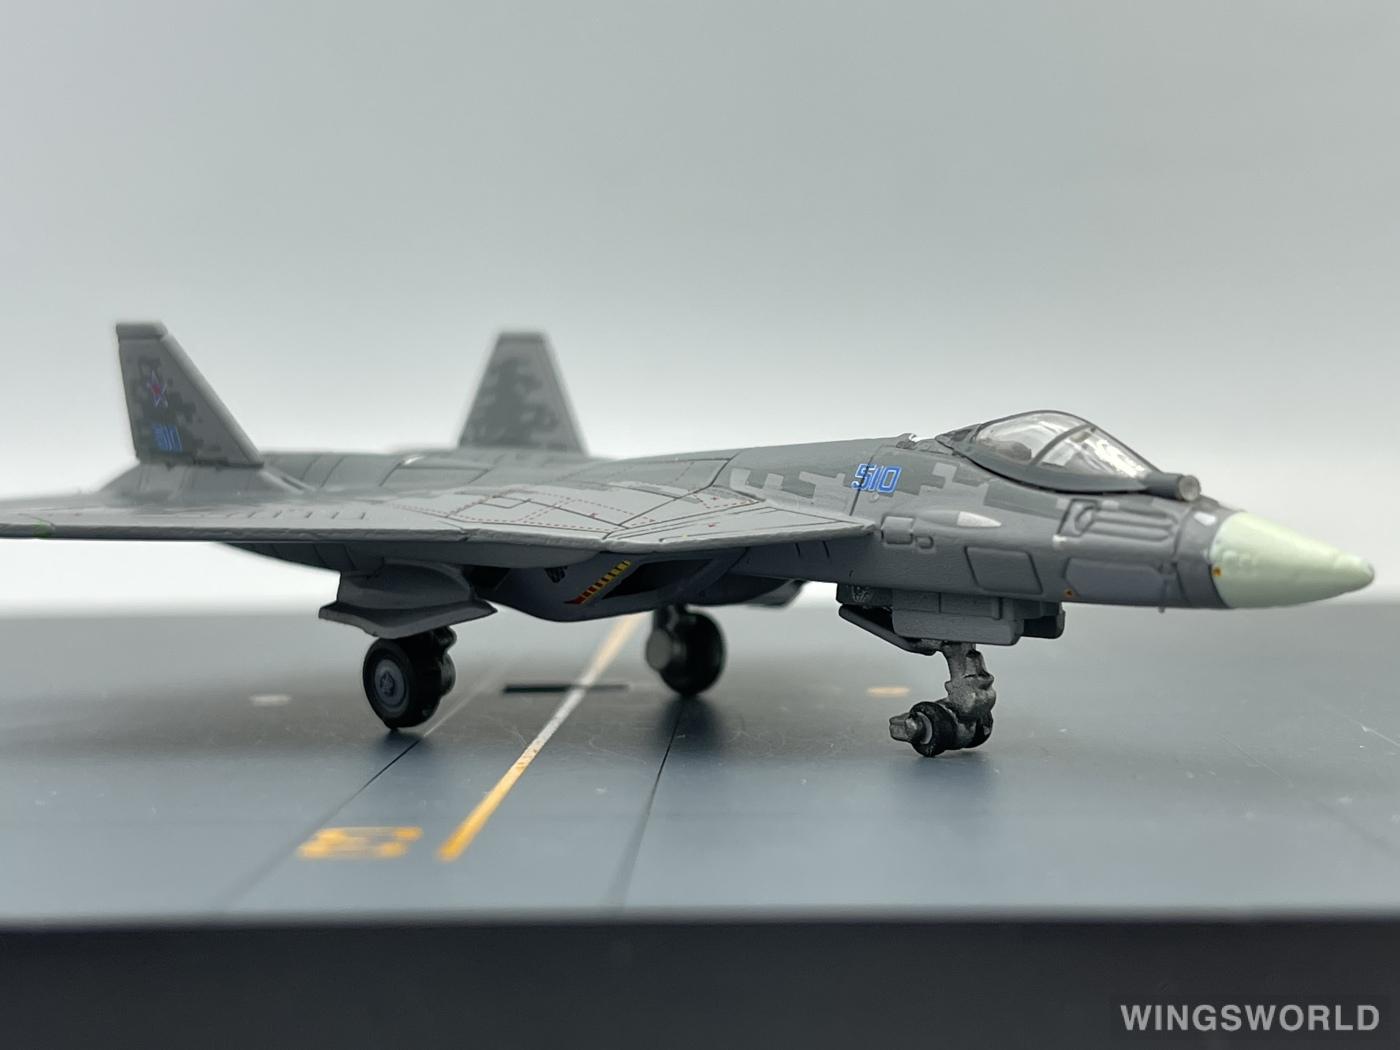 Herpa 1:200 570732 Sukhoi Aircraft Corporation 苏霍伊飞机公司 Sukhoi Su-57 510